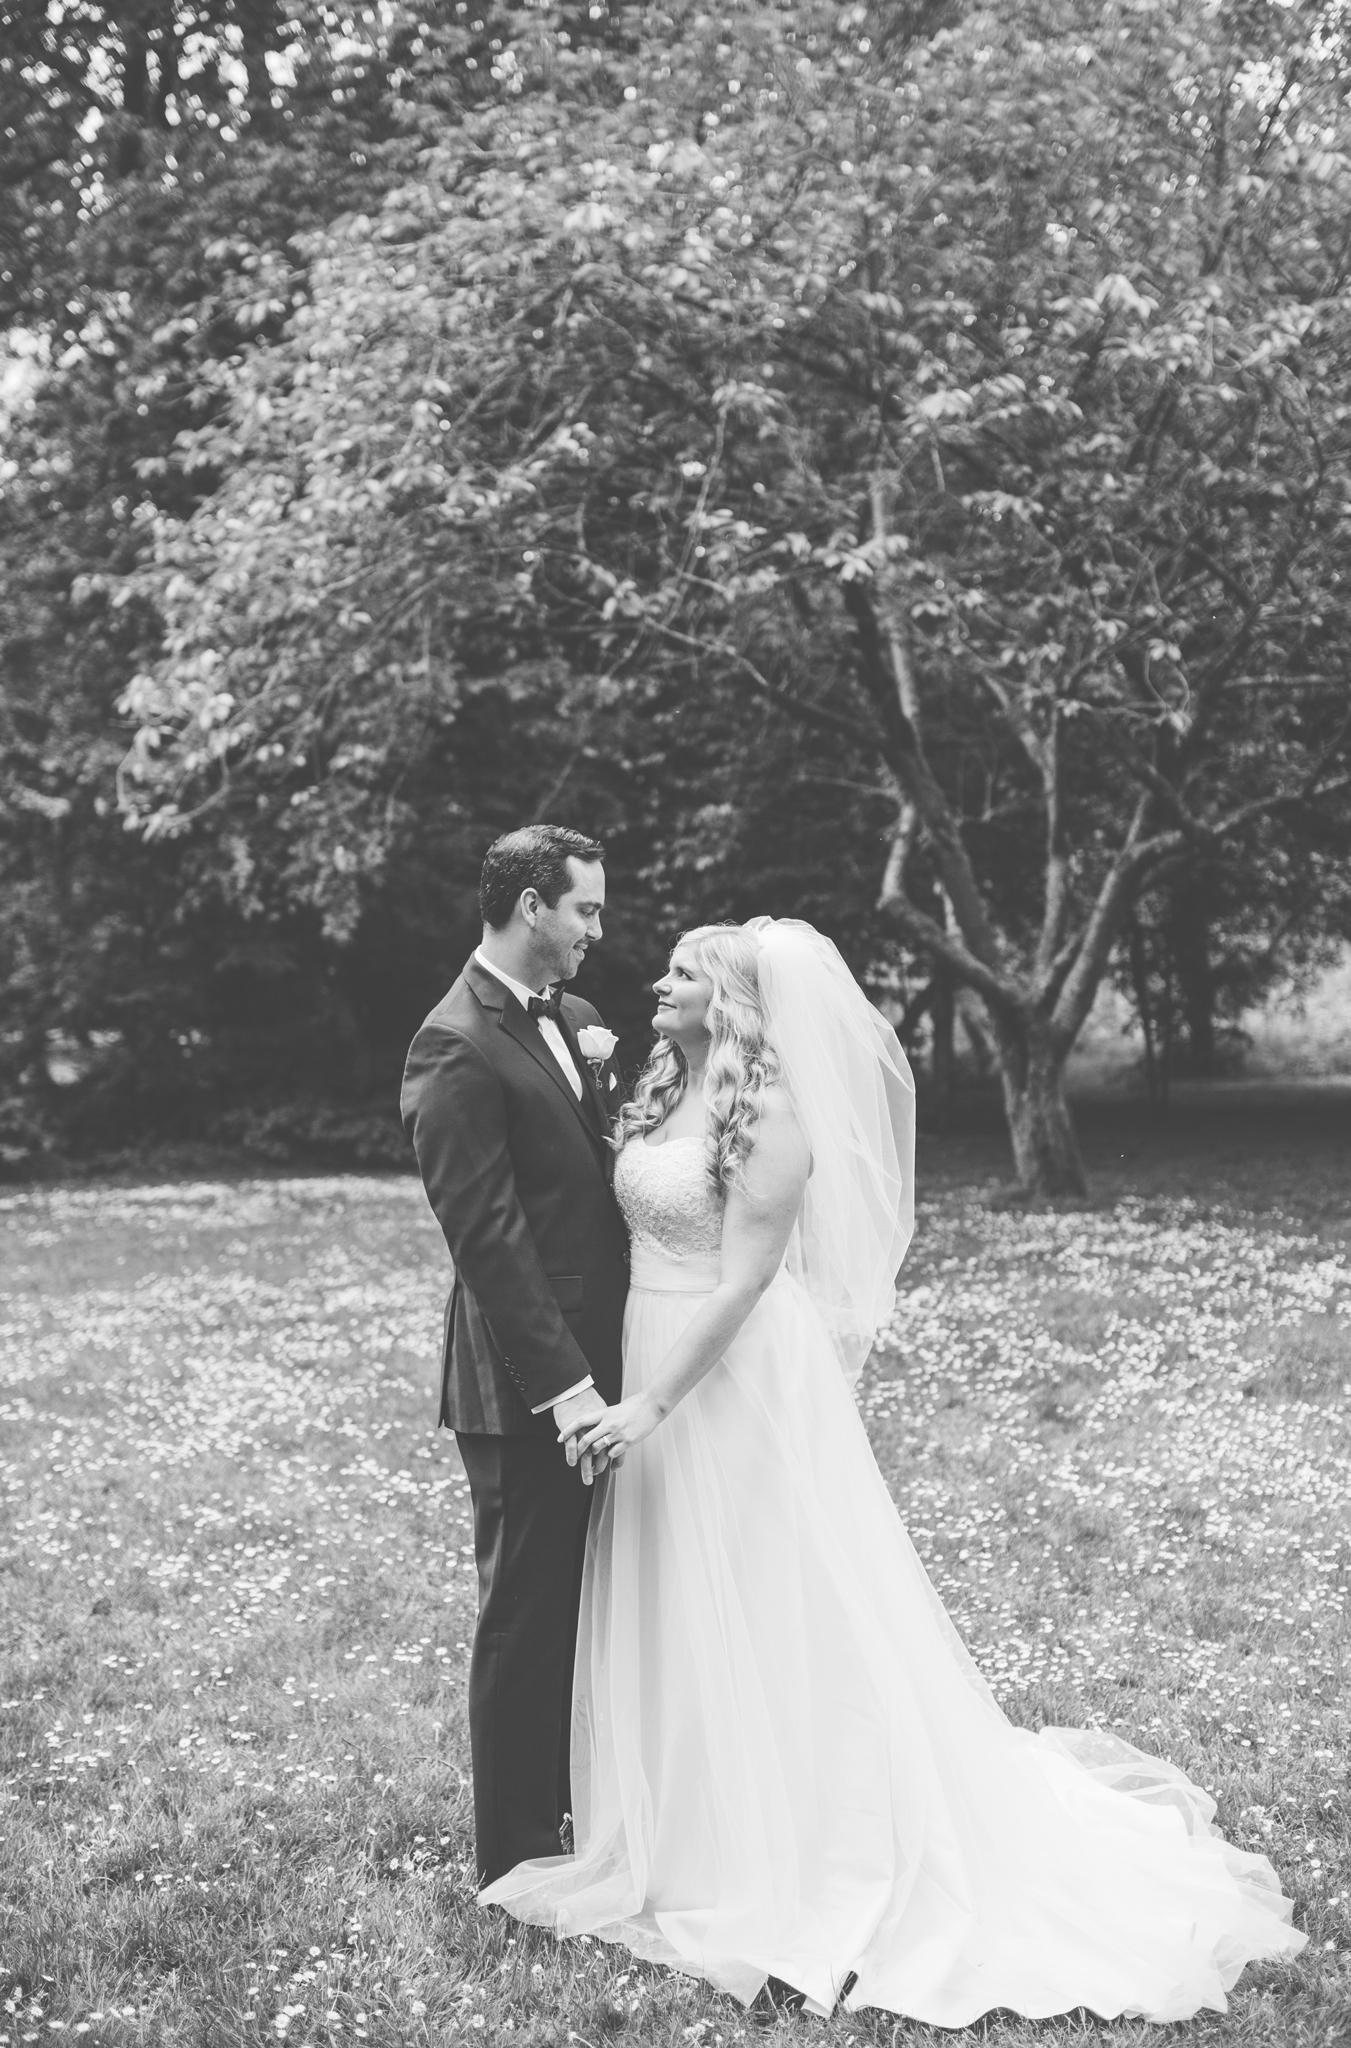 IMG_6160-VANCOUVER-WEDDING-PHOTOGRAPHER-JENNIFER-PICARD-PHOTOGRAPHY.jpg